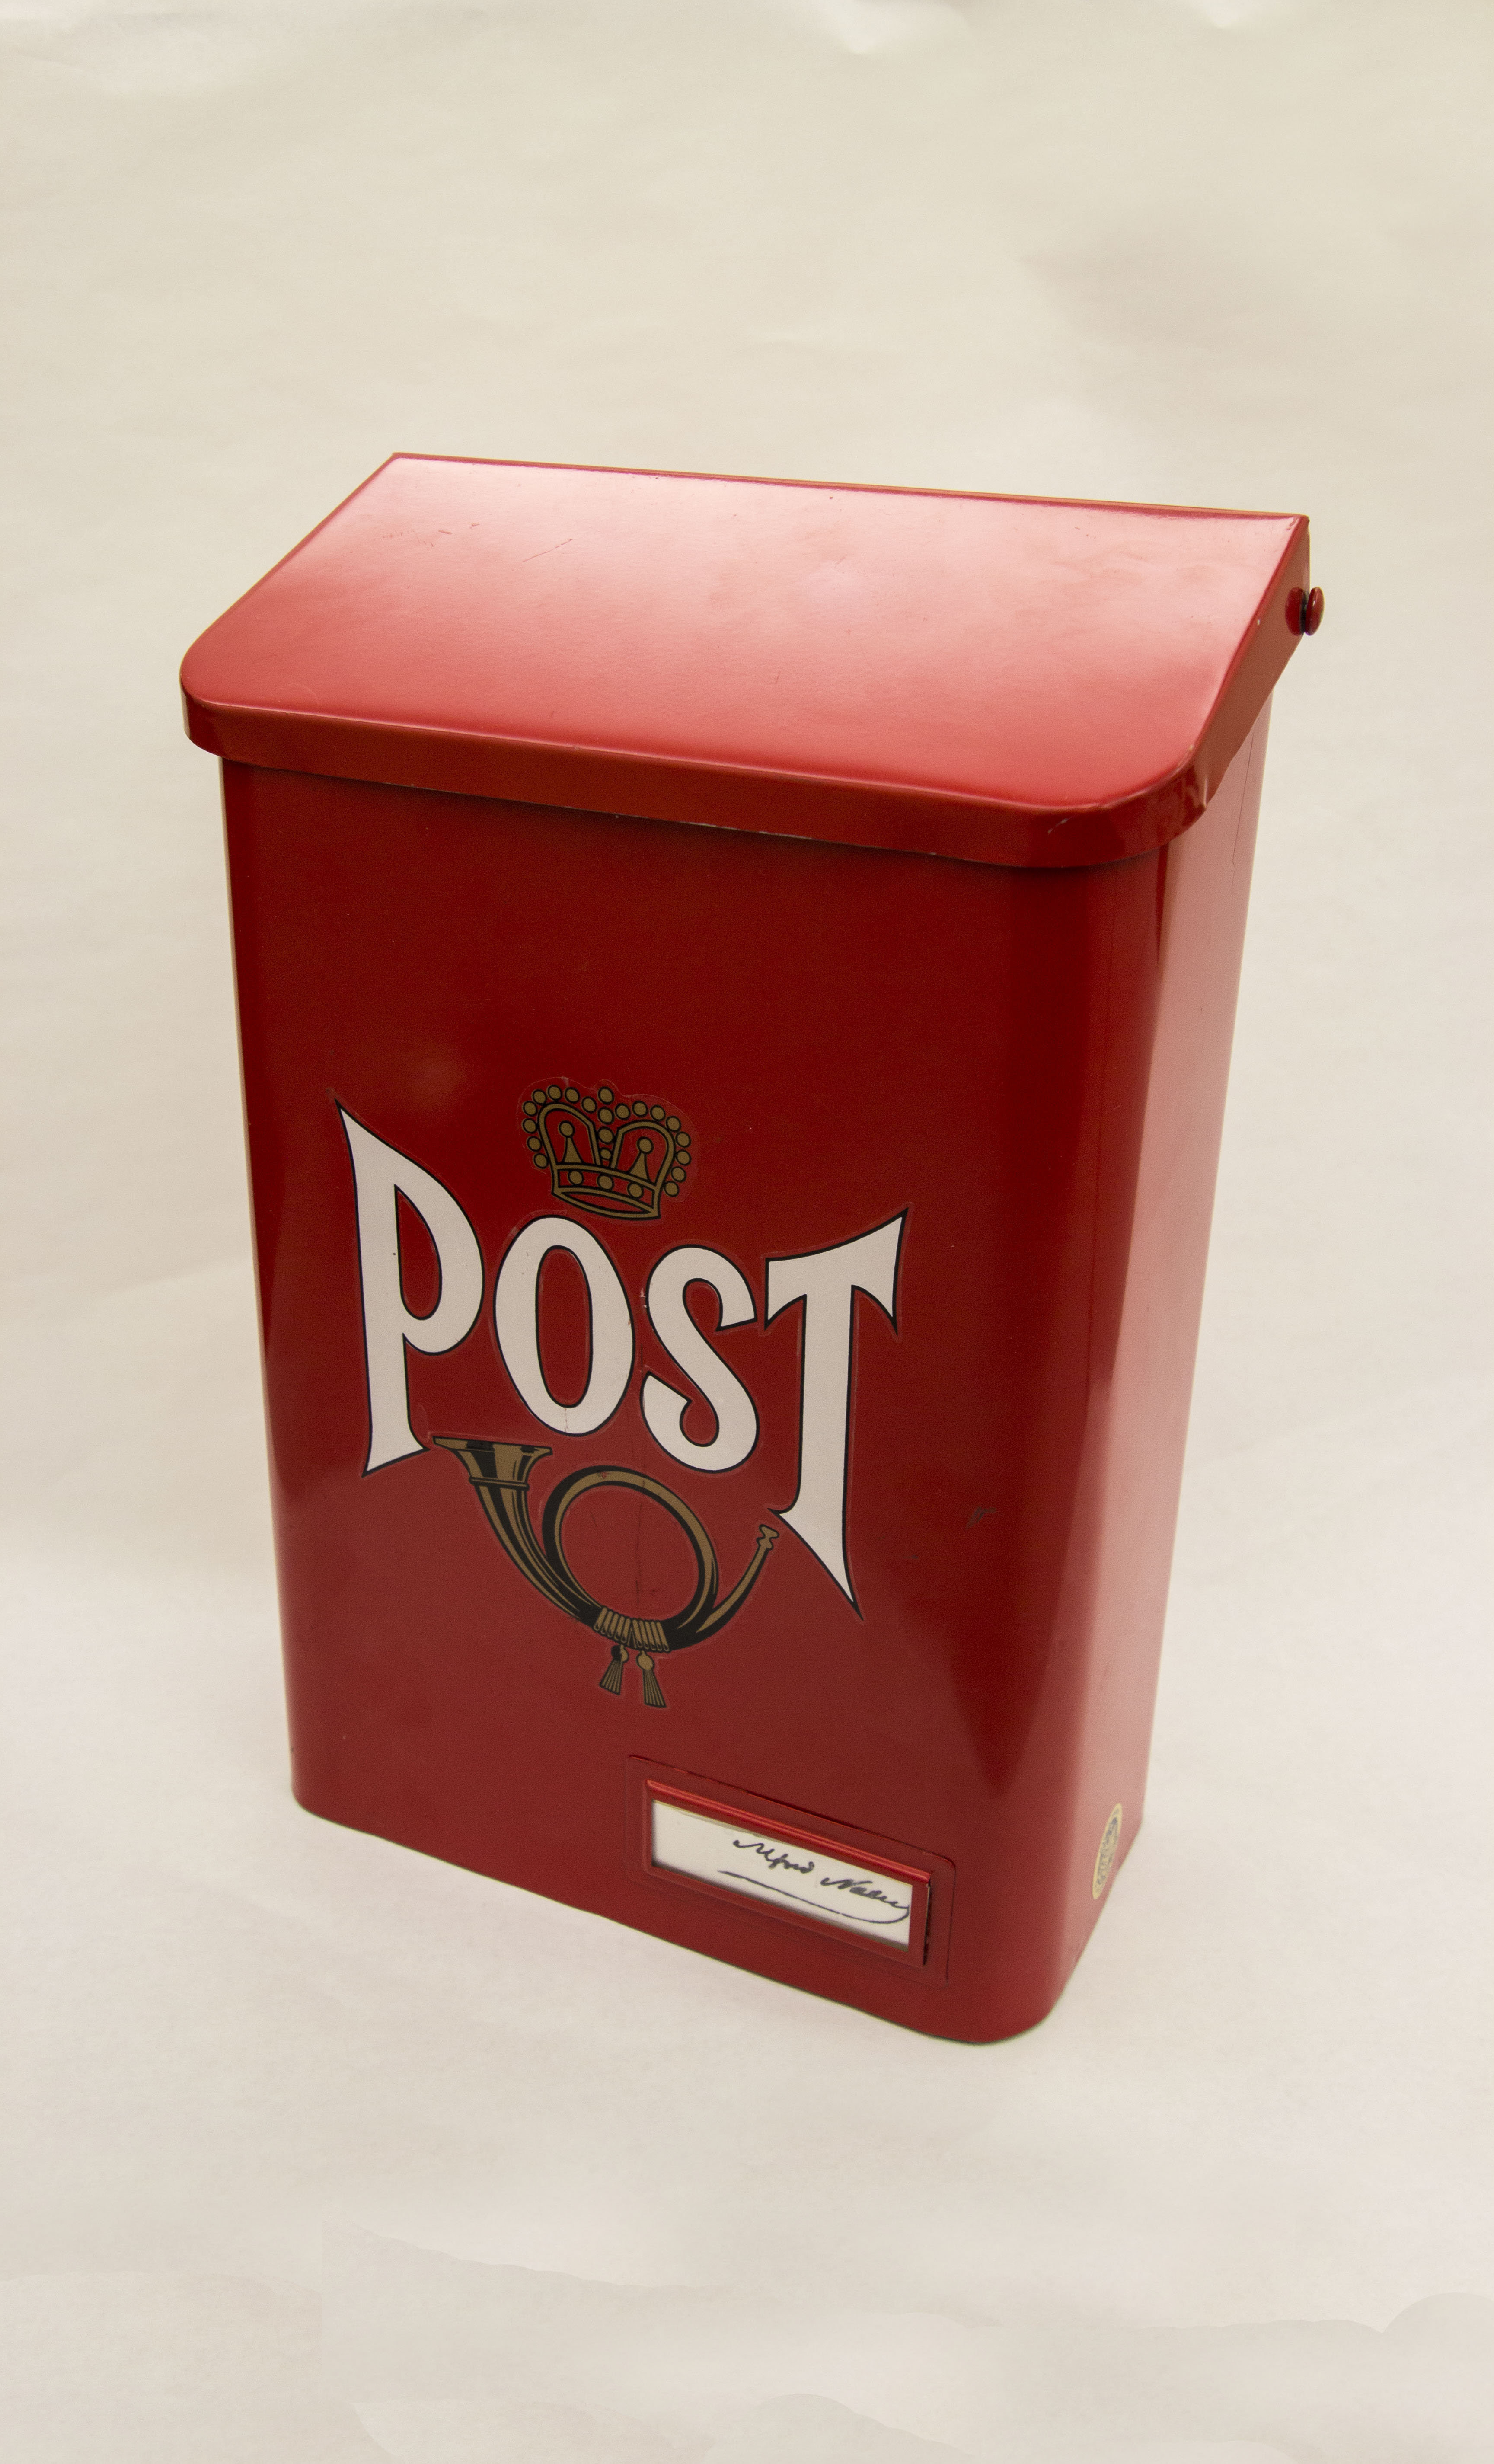 Alfred Nobel's Postbox